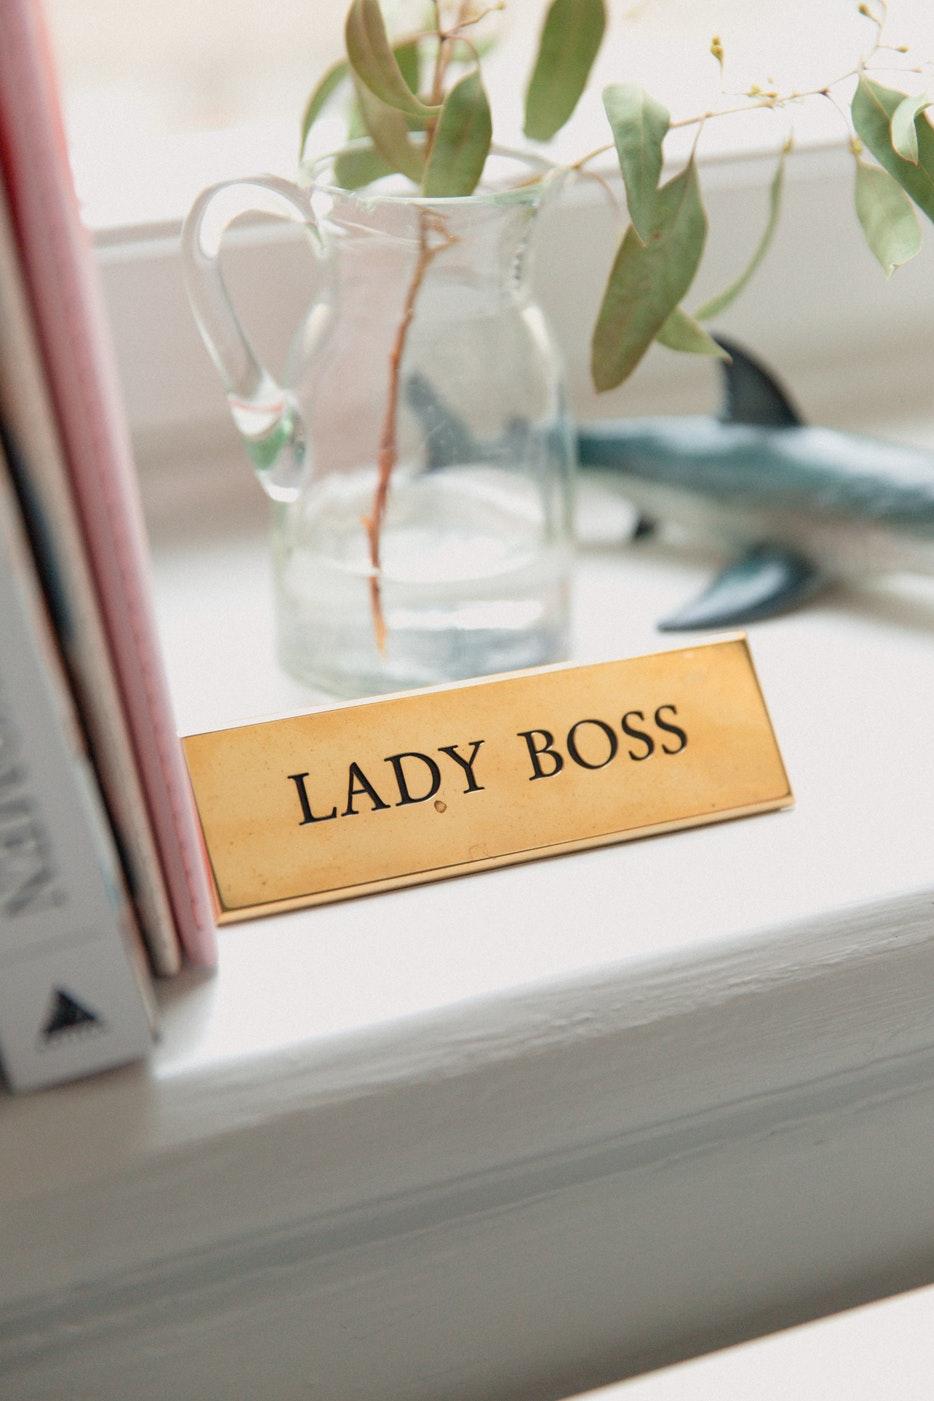 #freelance #blogueuse #blog #coaching #formation #pinterest #socialmedia #blogueuse